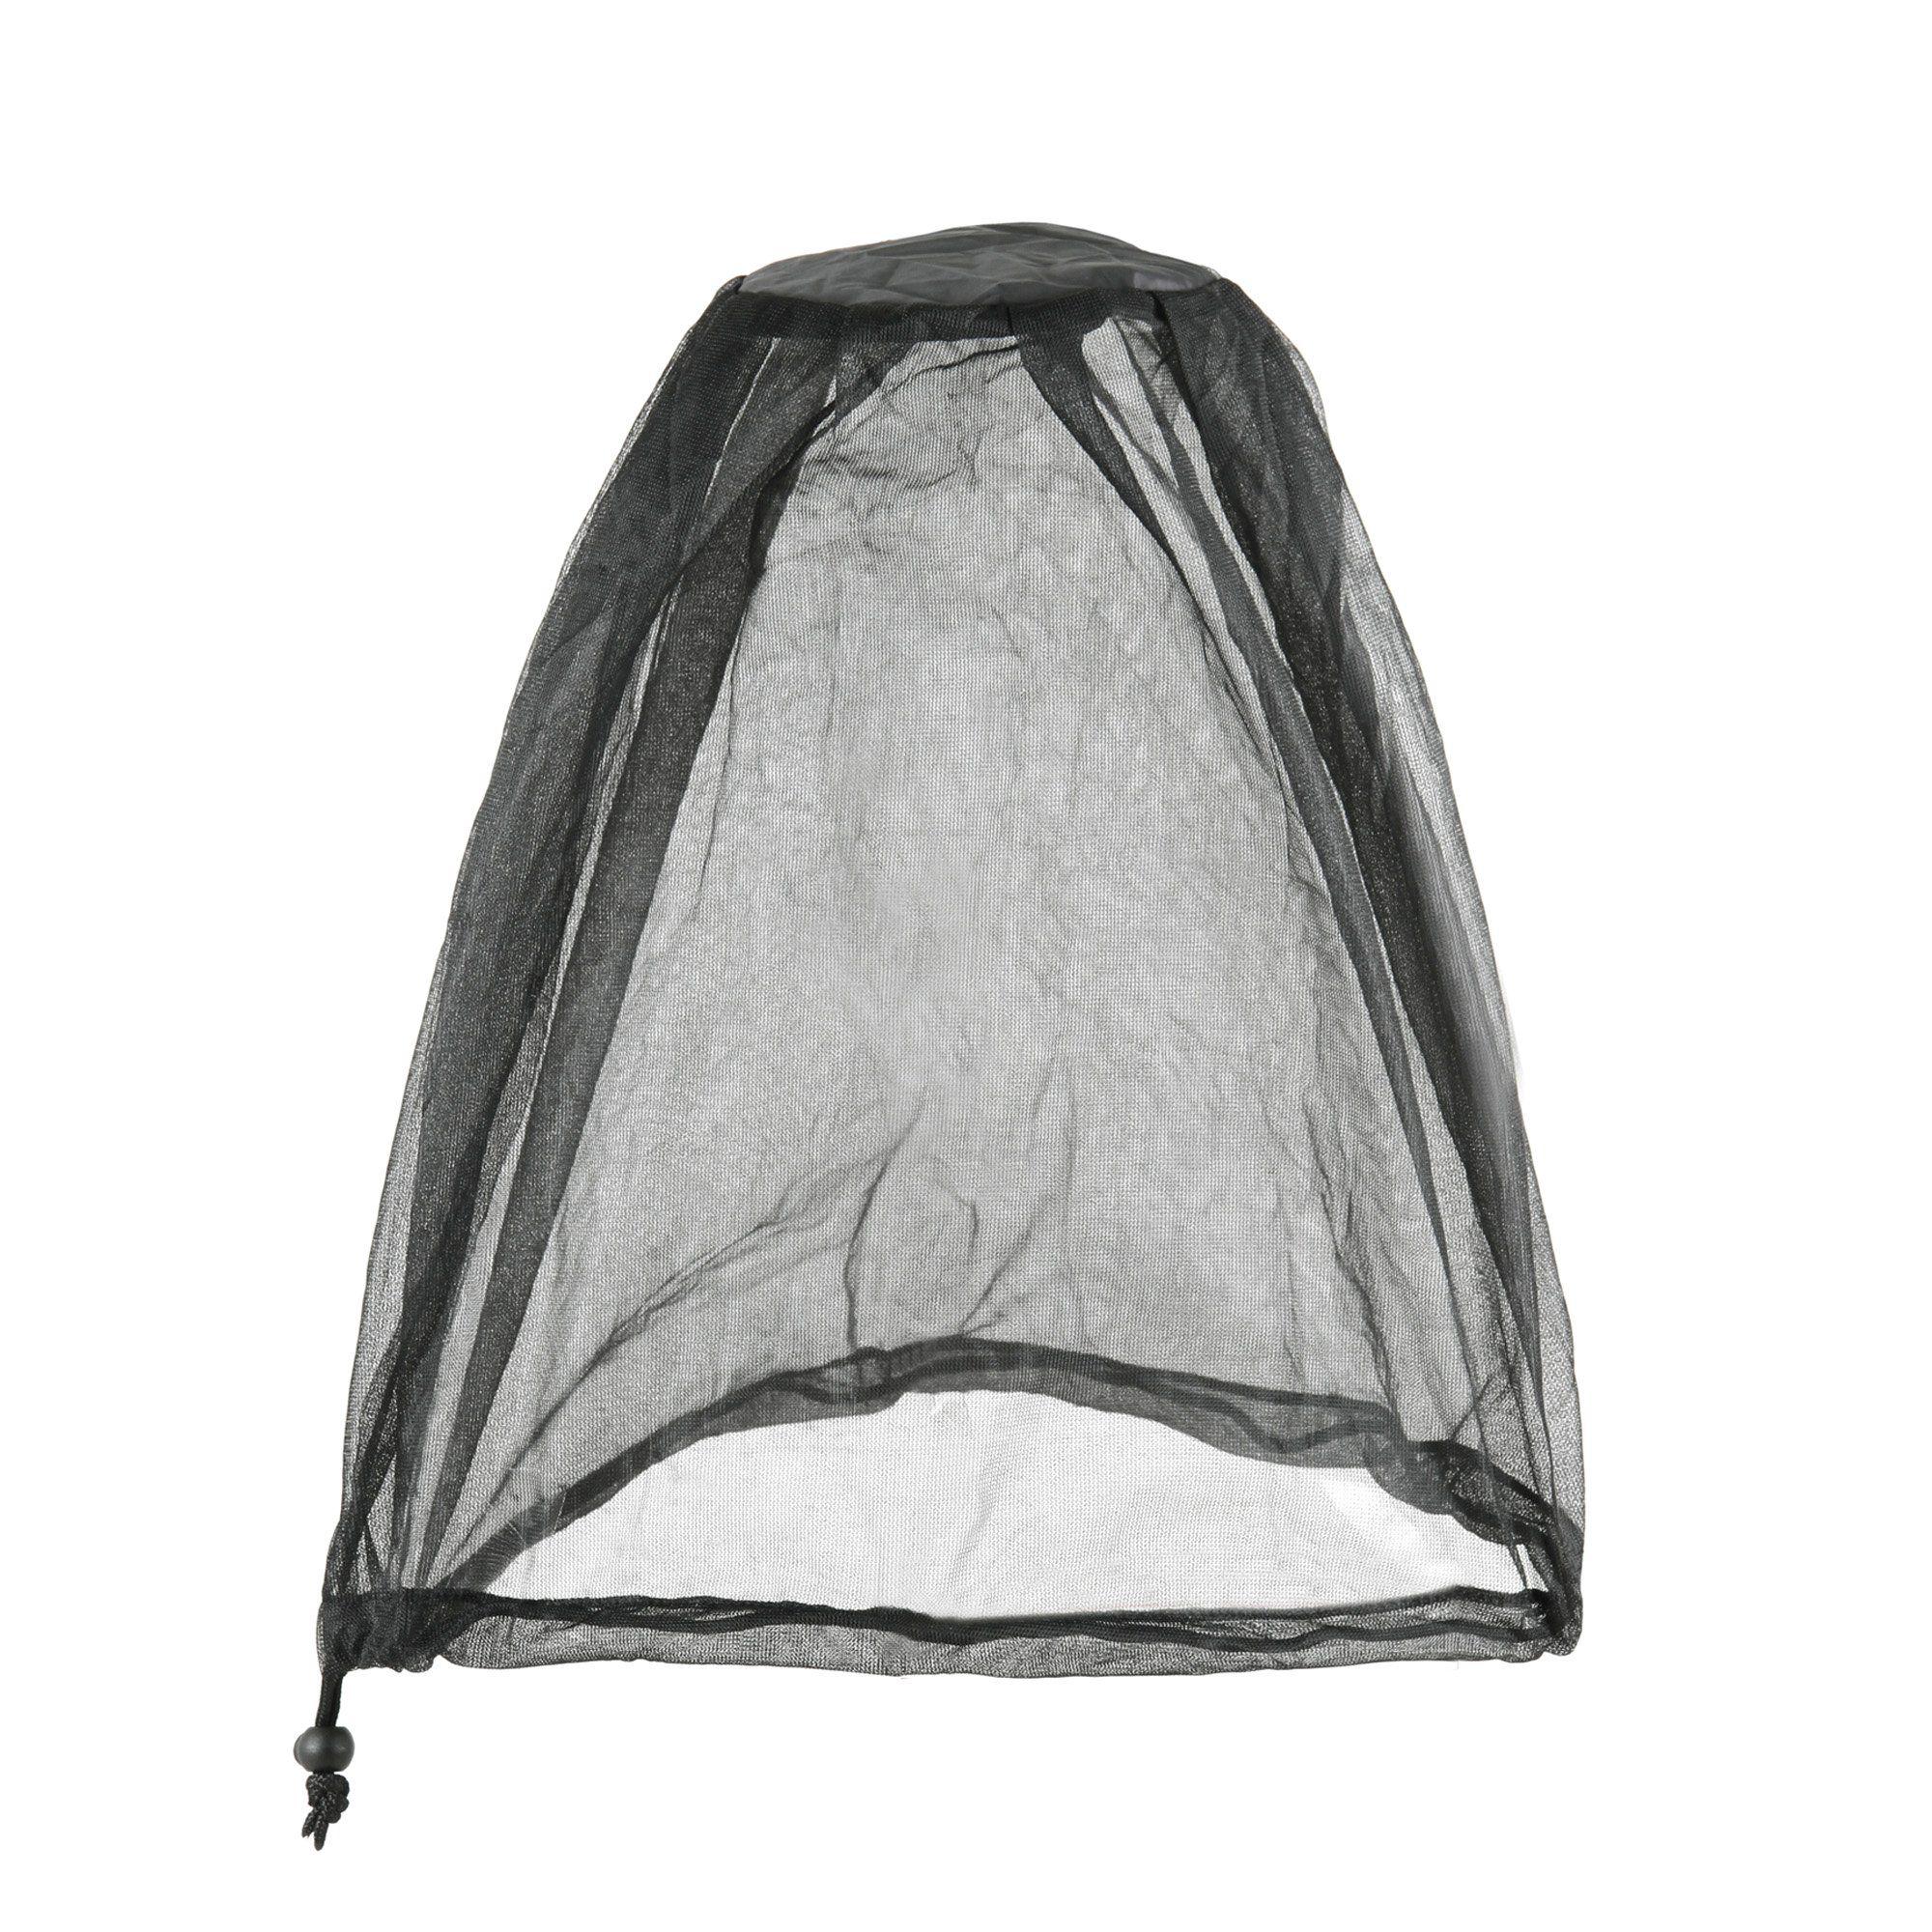 Lifesystems Mosquito Head Net